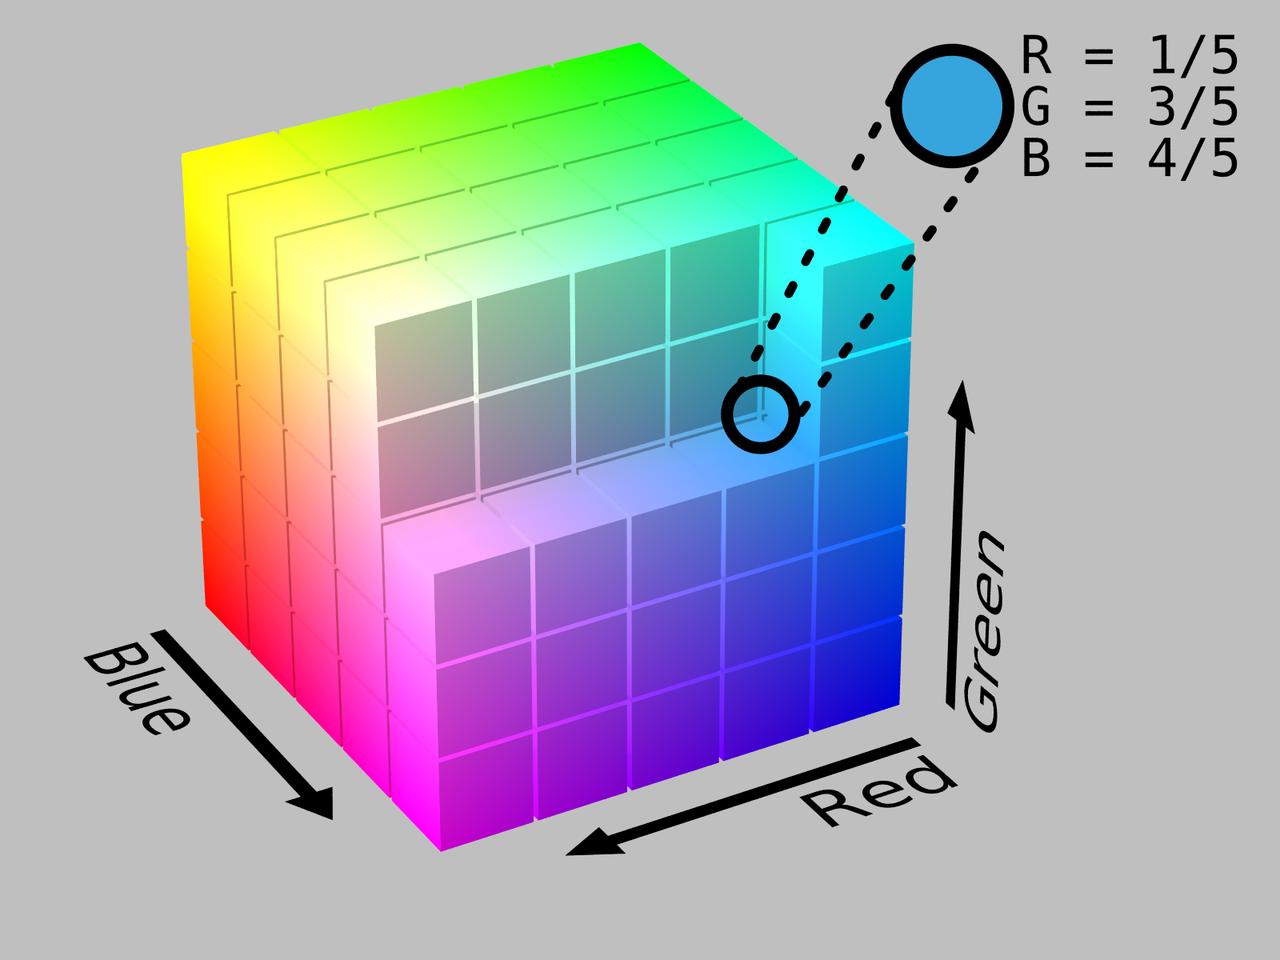 1280px-RGB_Cube_Show_lowgamma_cutout_b.png